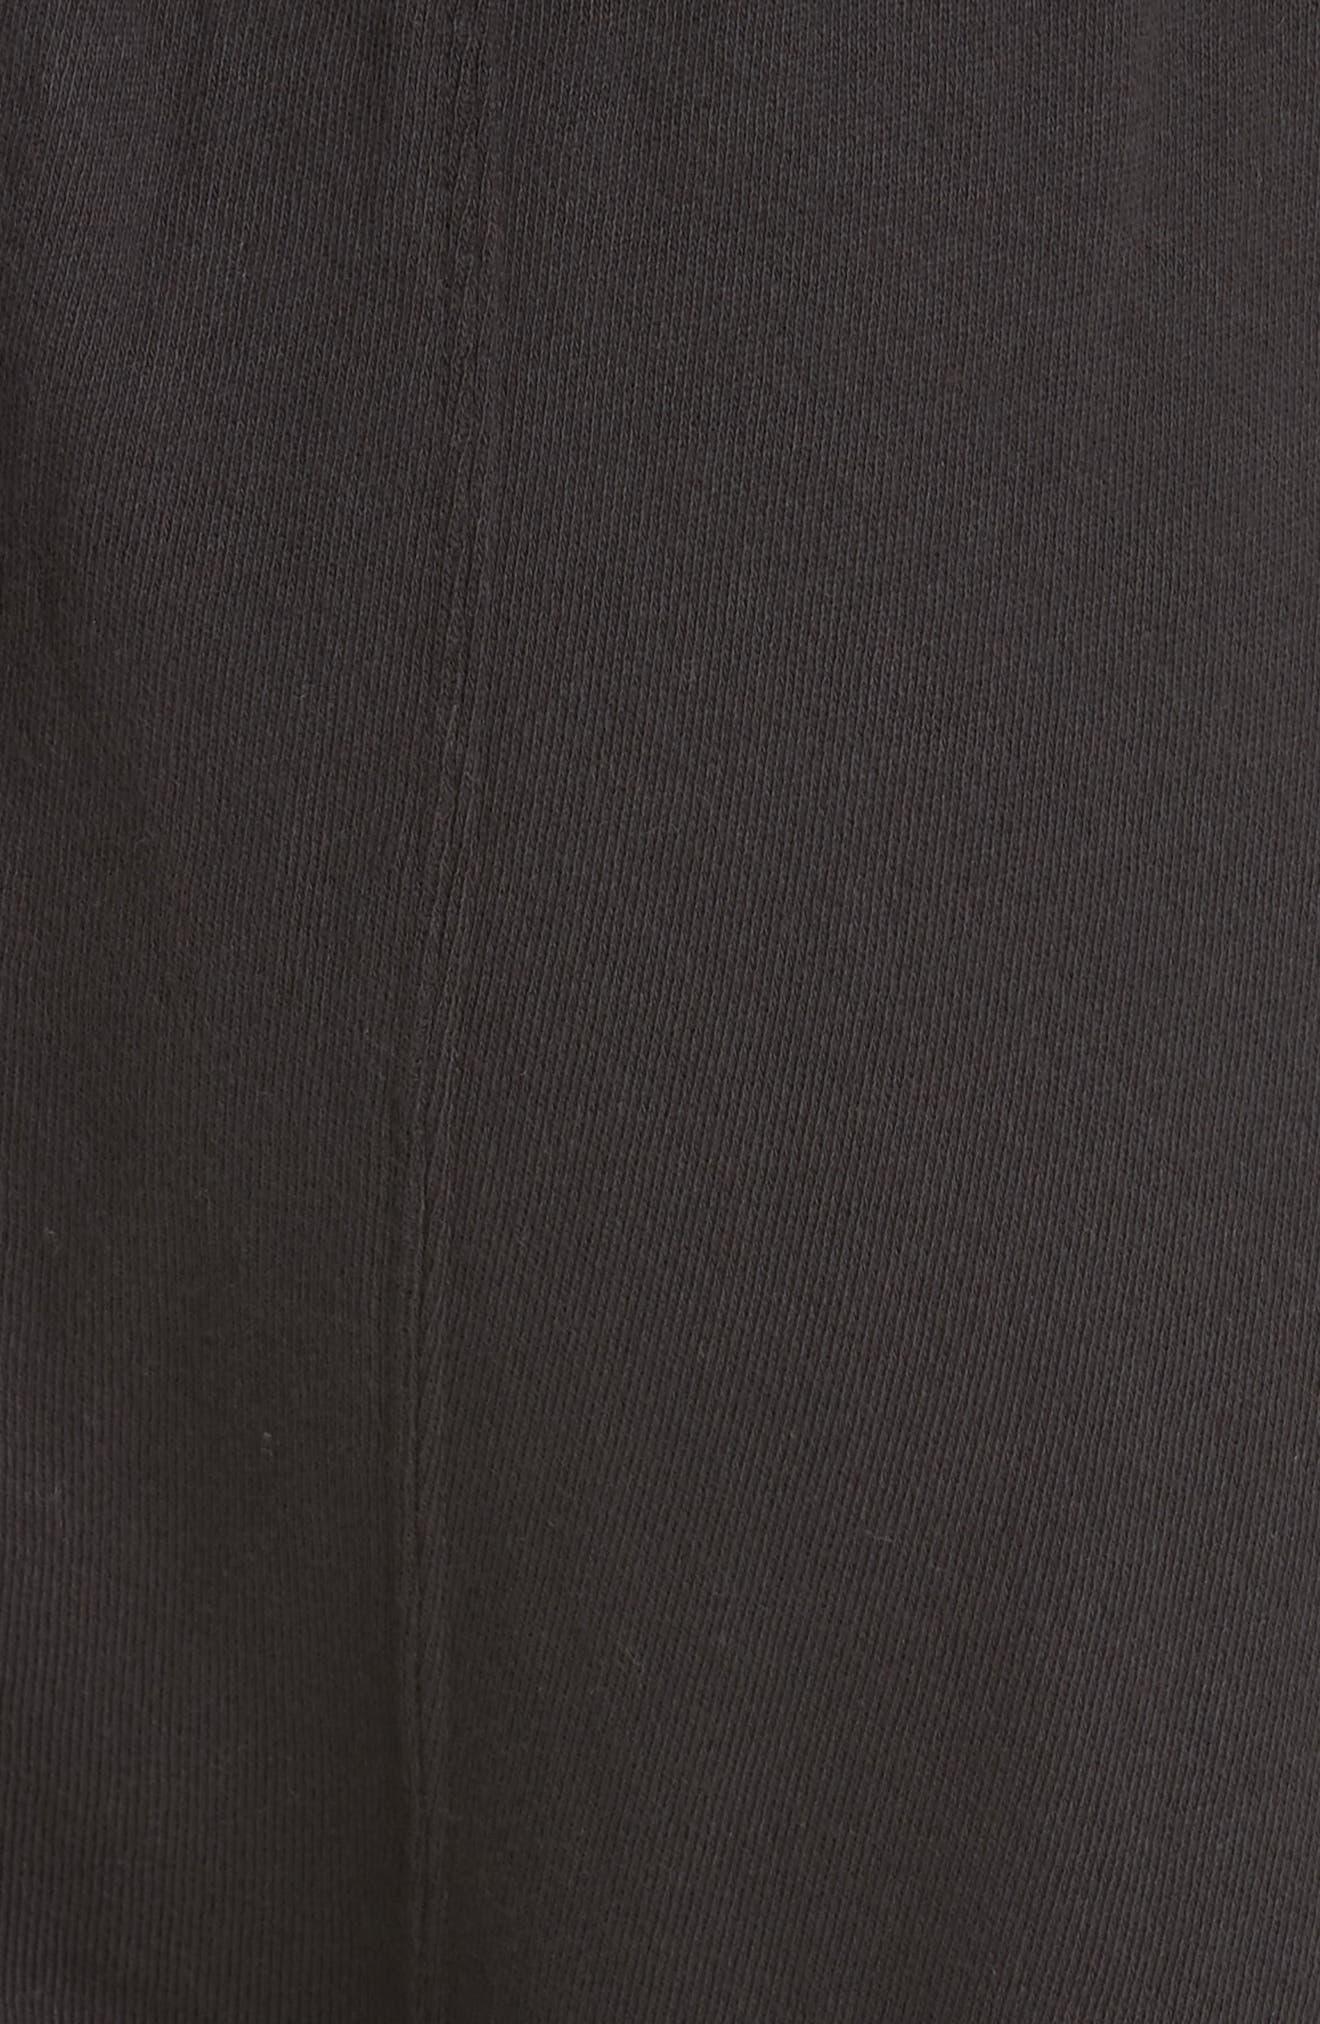 The Pajama Sweatpants,                             Alternate thumbnail 5, color,                             ALMOST BLACK